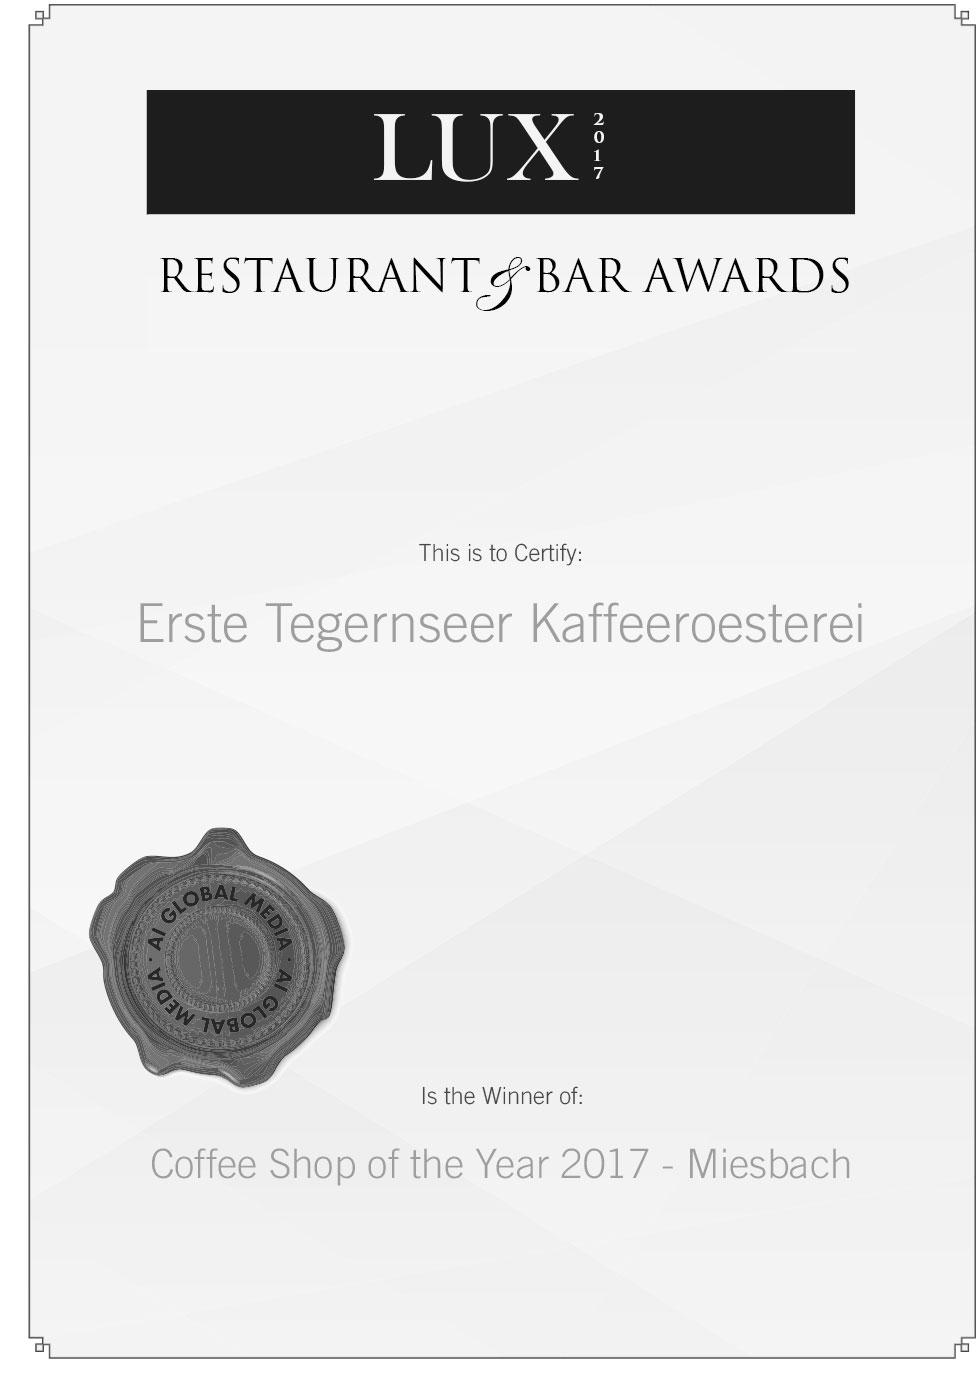 RE170018 Certificate